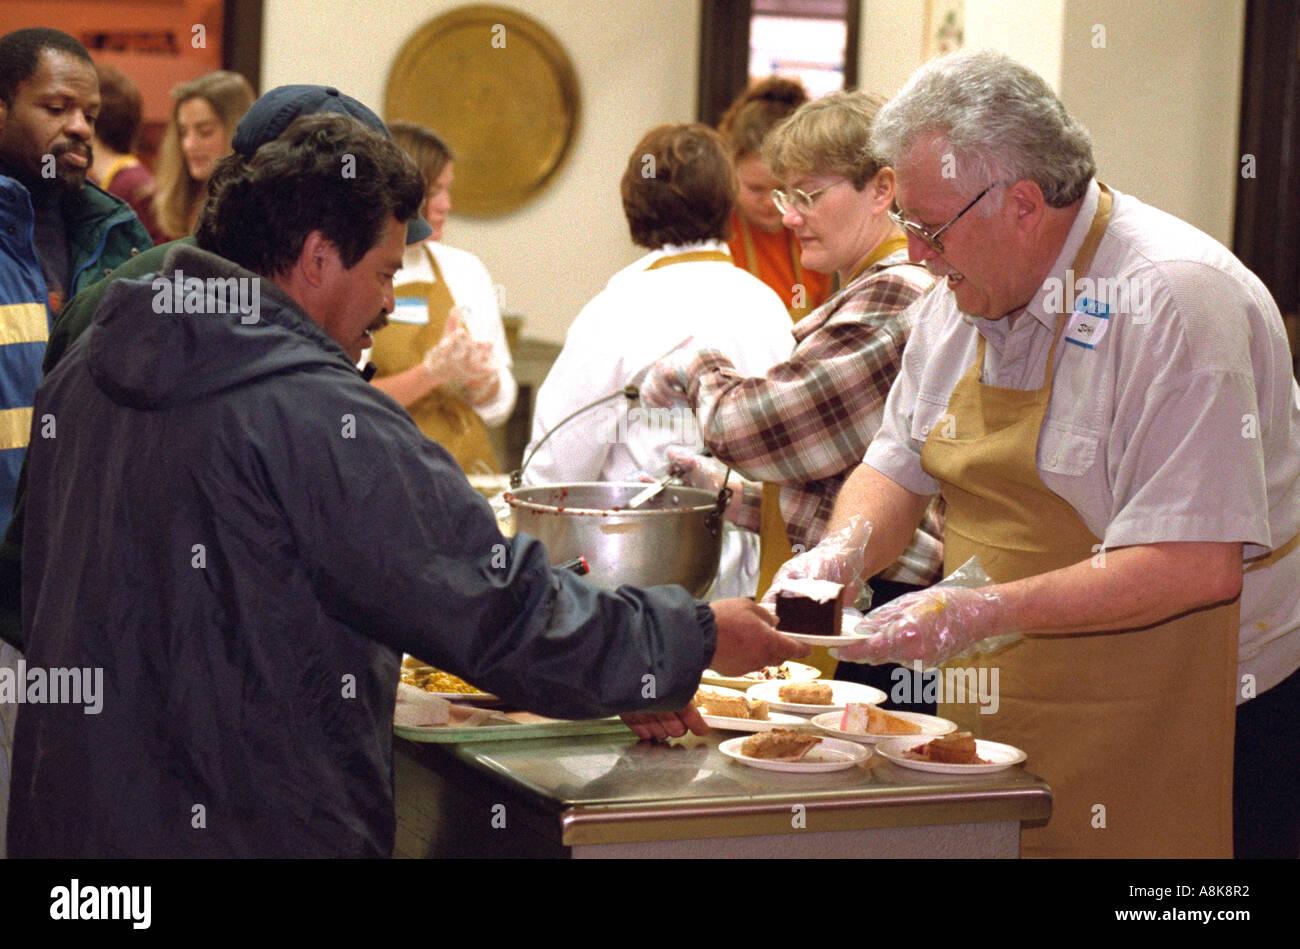 ordinary Soup Kitchens Minneapolis #8: Stock Photo - Volunteers serving Exchange Charities Thanksgiving soup kitchen dinner. Minneapolis Minnesota USA